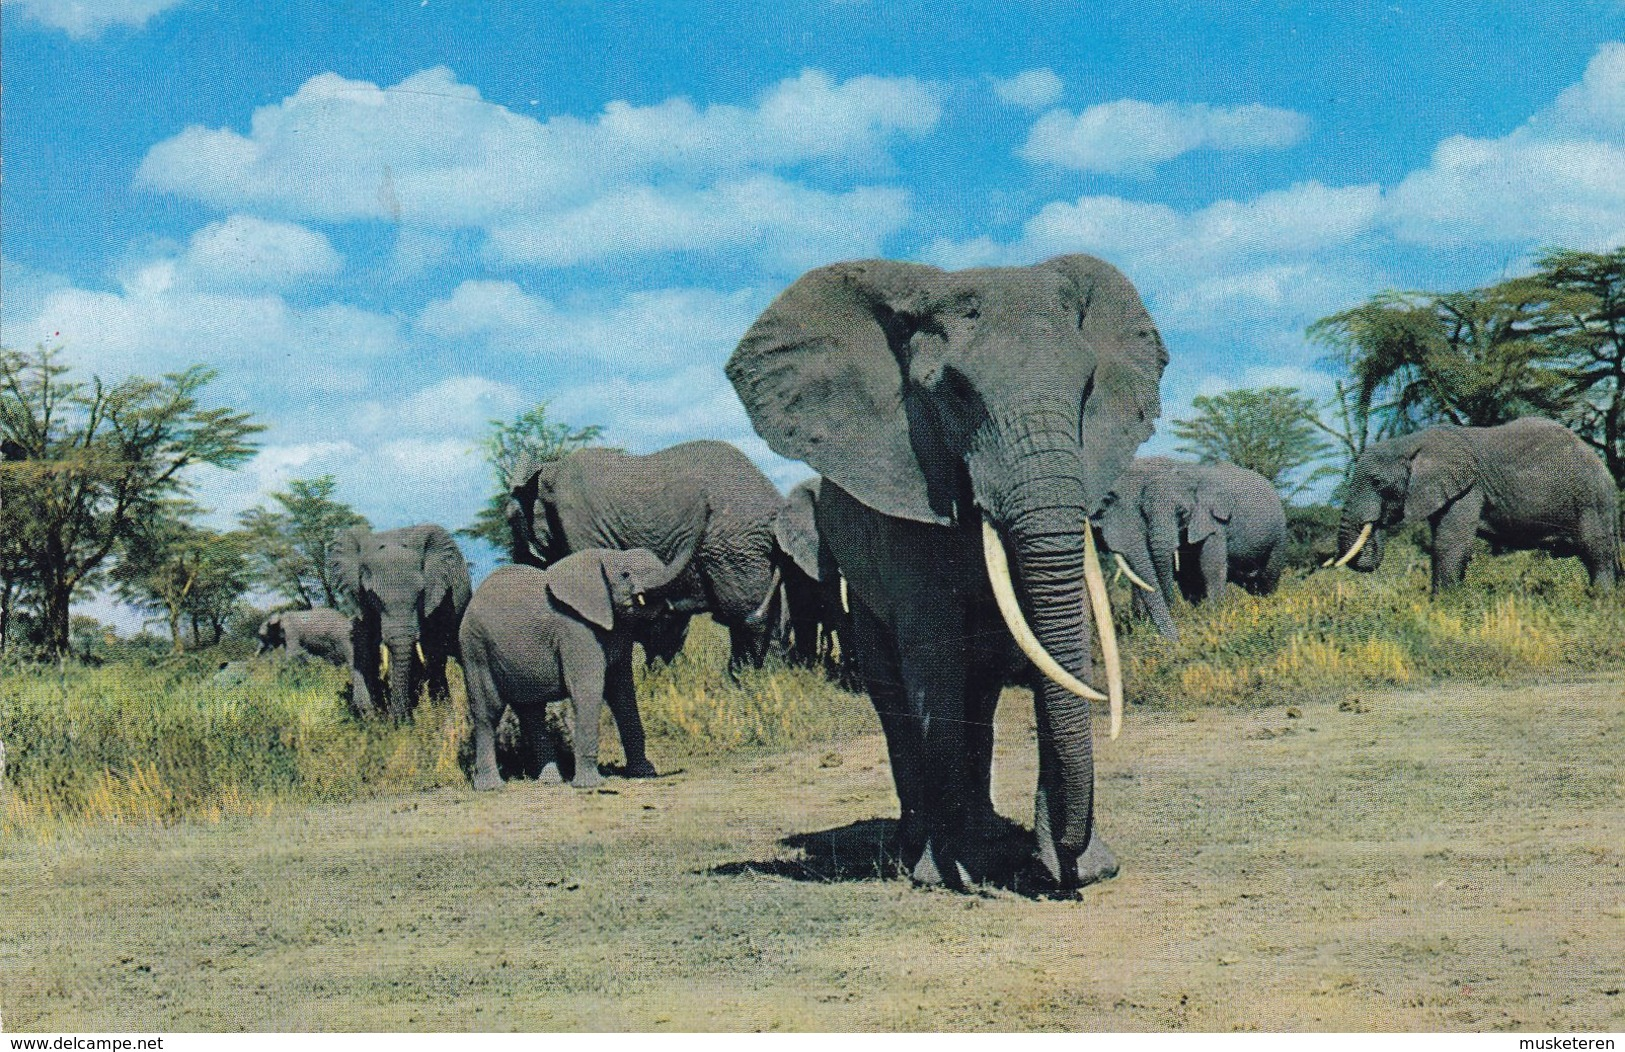 Tanzania PPC BY AIR MAIL PAR AVION Label African Wild Life Elephants Elefanten ARUSHA 1967 RICKENBACH Switzerland Zebra - Tansania